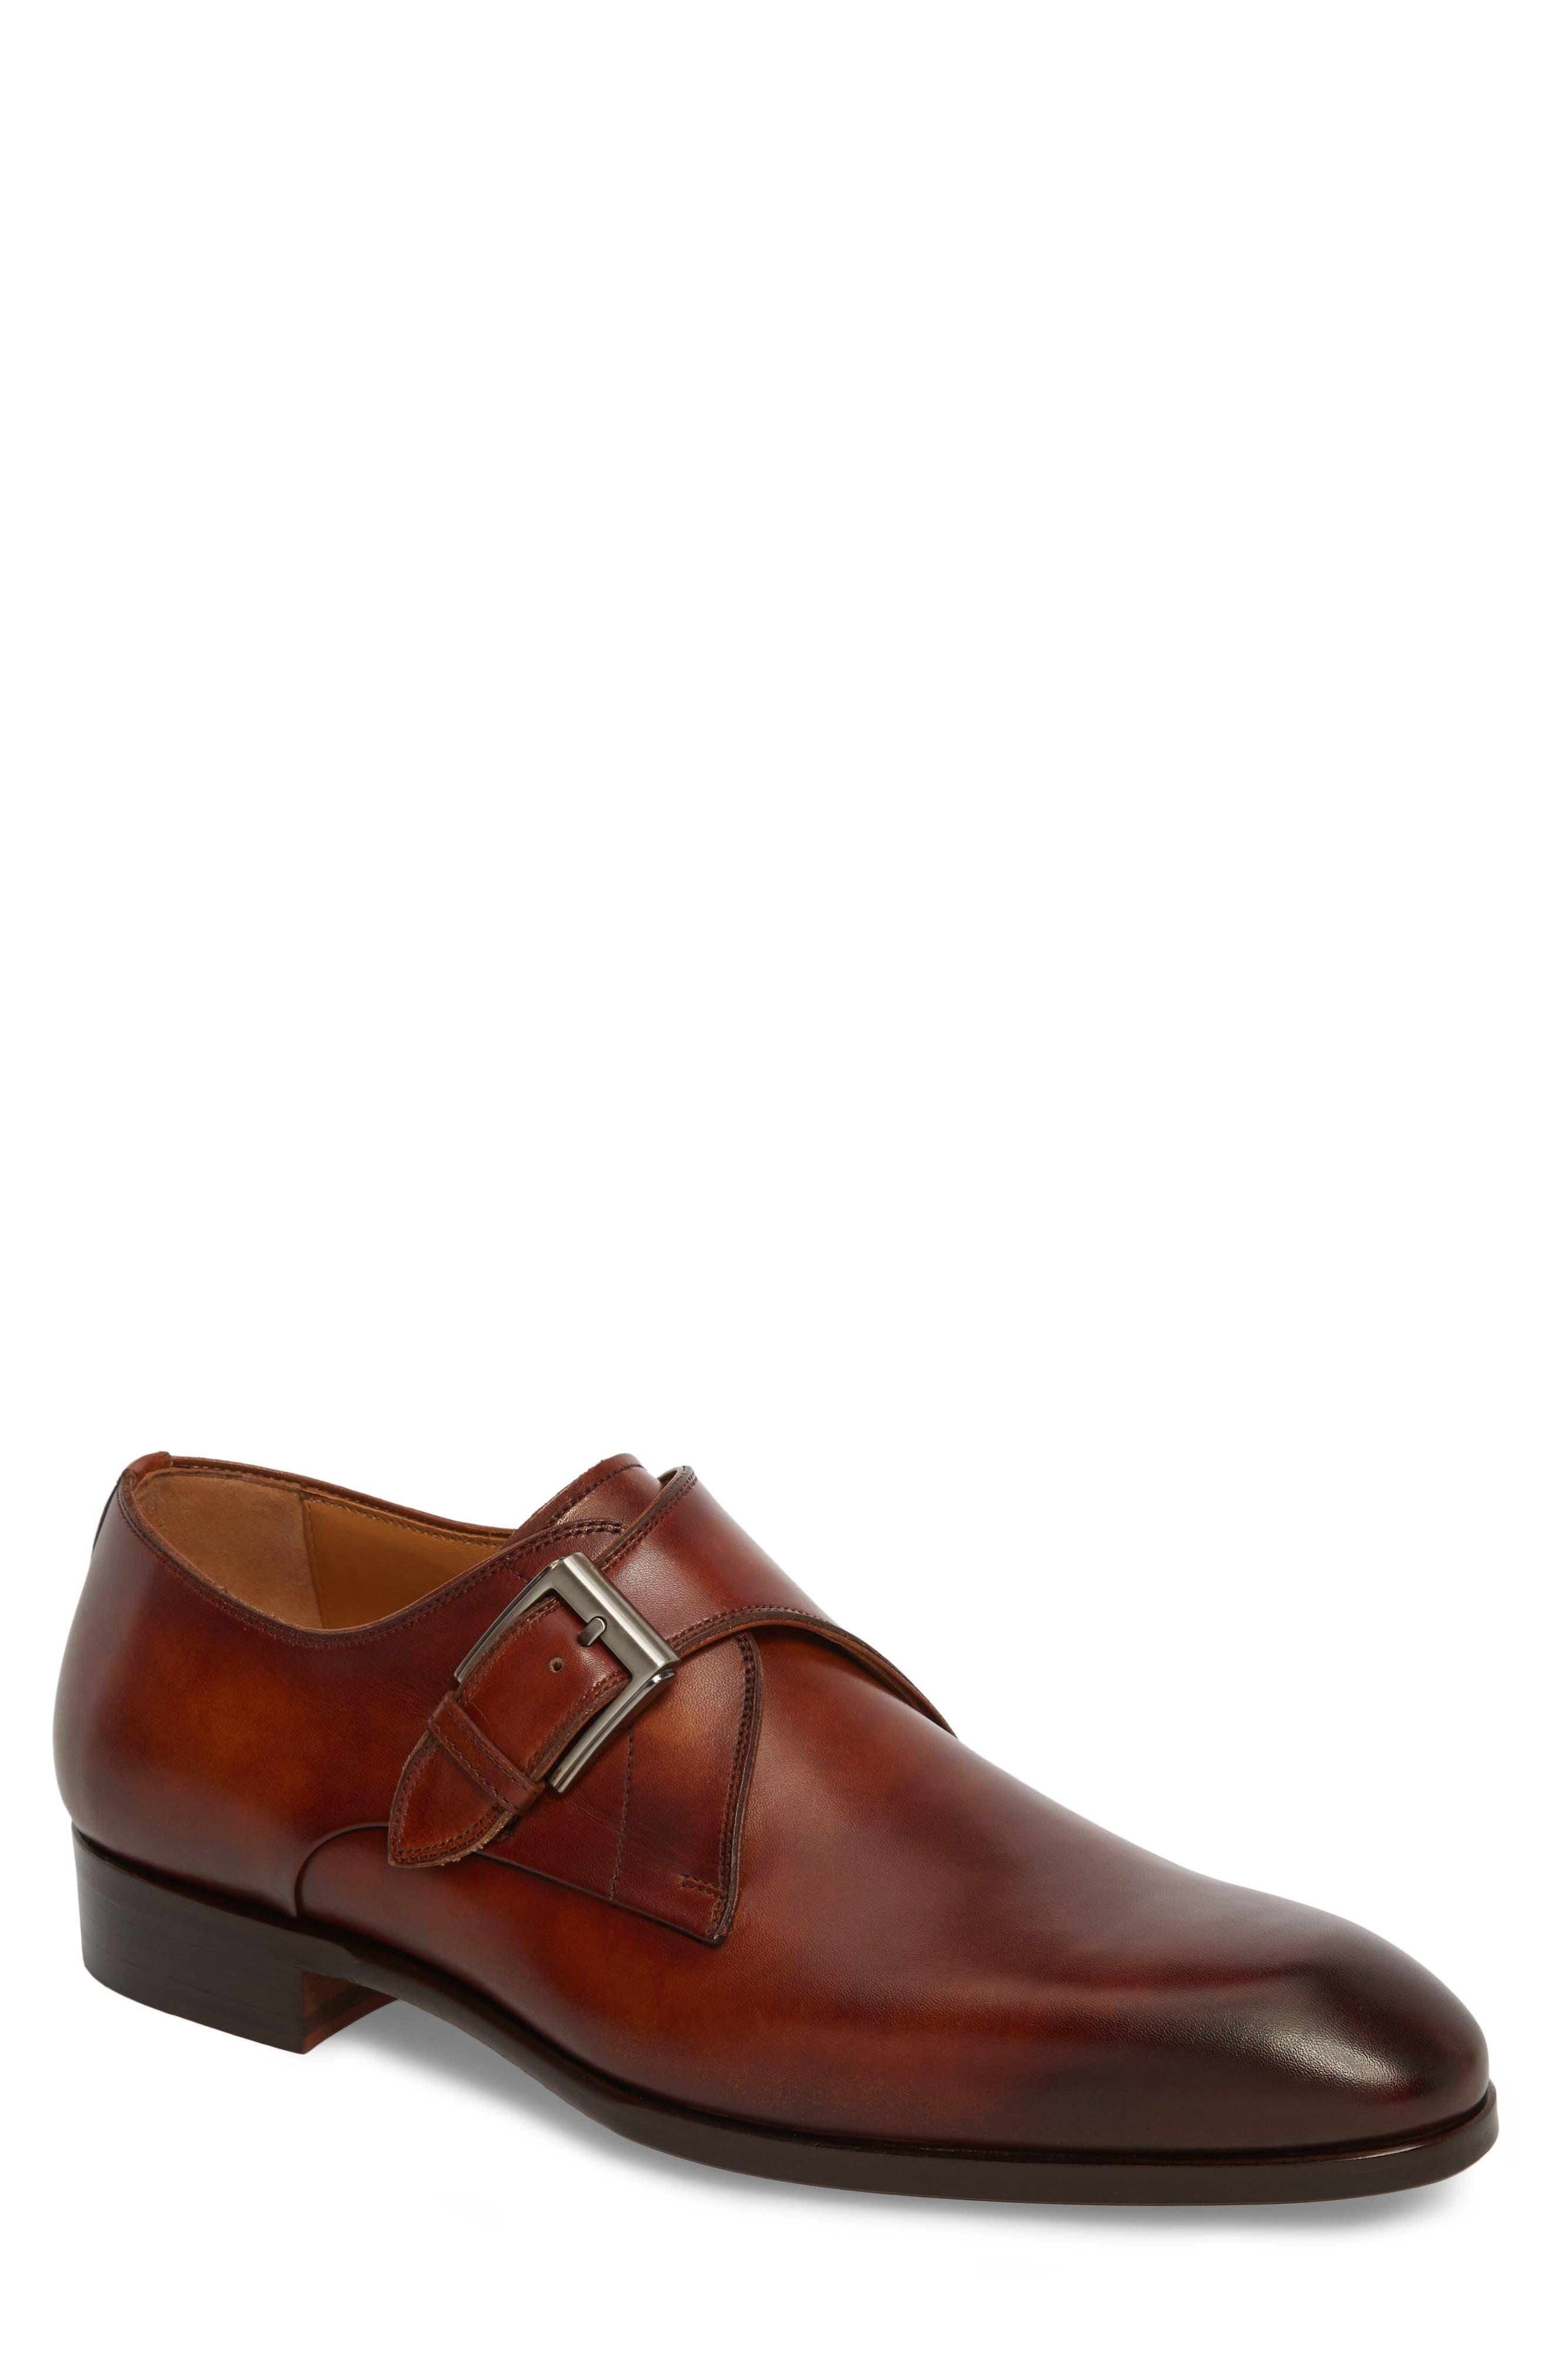 Lazaro Single Buckle Monk Shoe,                         Main,                         color, BROWN LEATHER